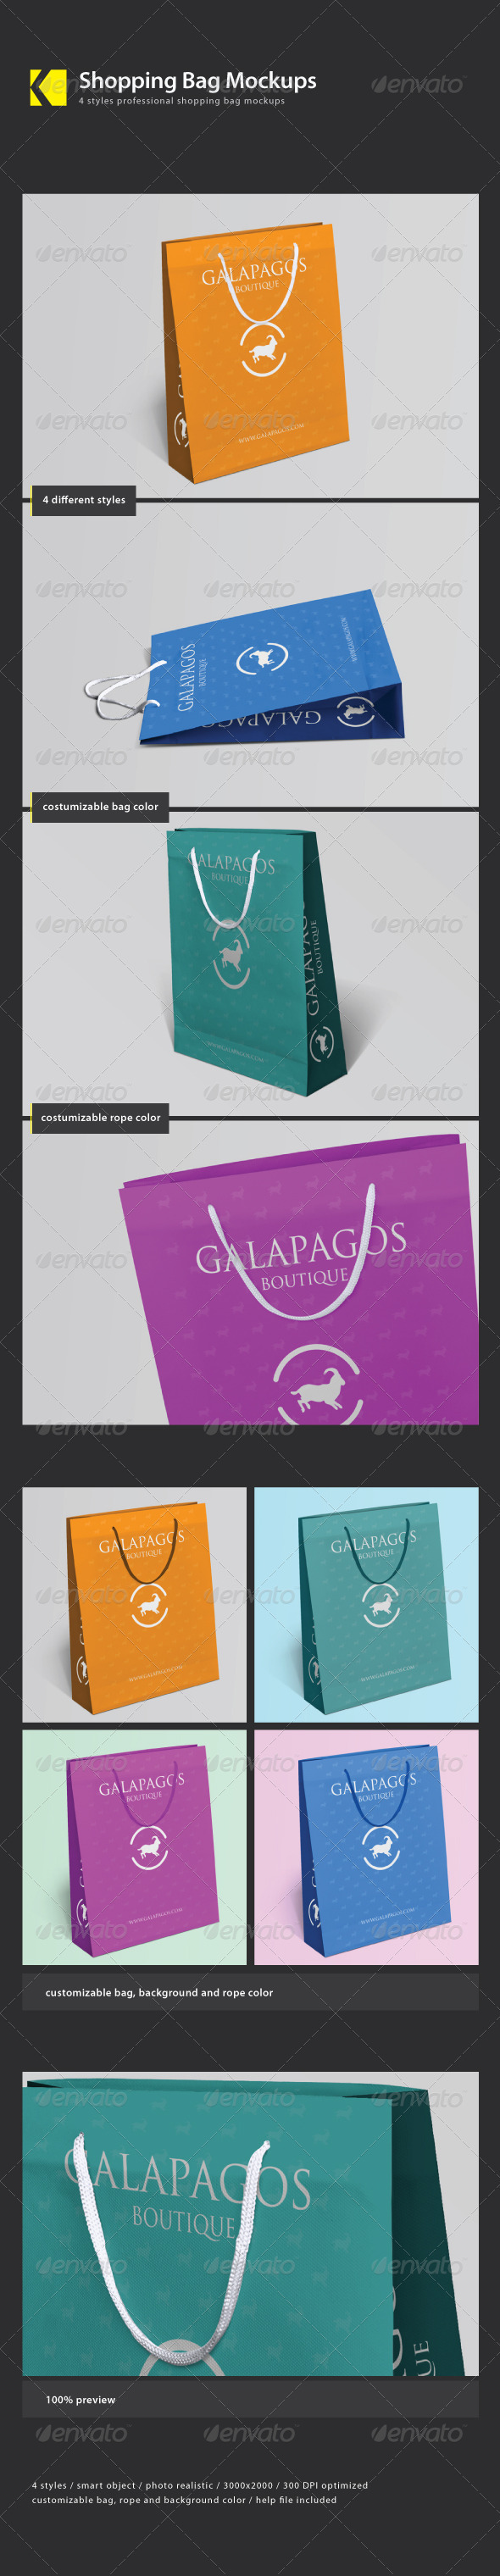 Shopping Bag Mockups - Beauty Packaging